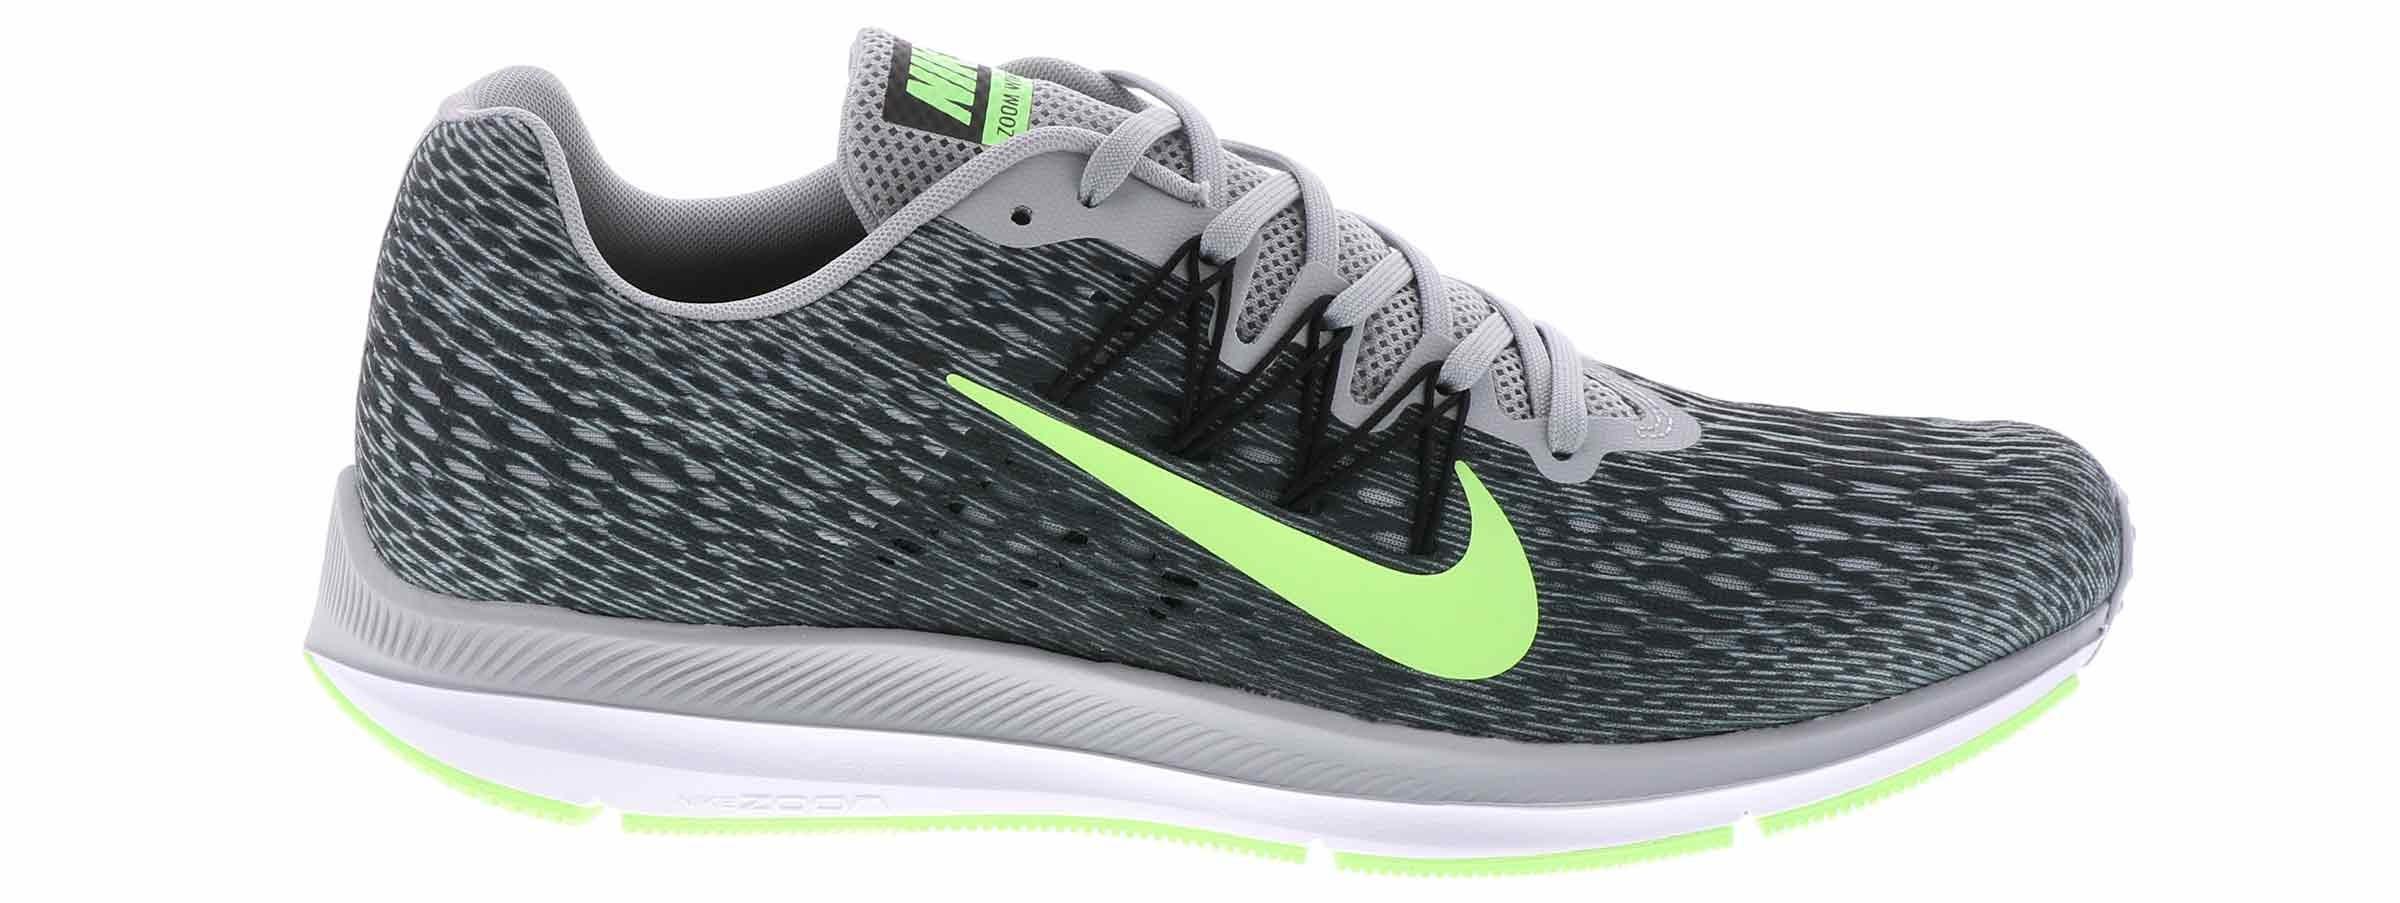 sale retailer 98f1a 0fd0c Men's Nike Air Zoom Winflo 5